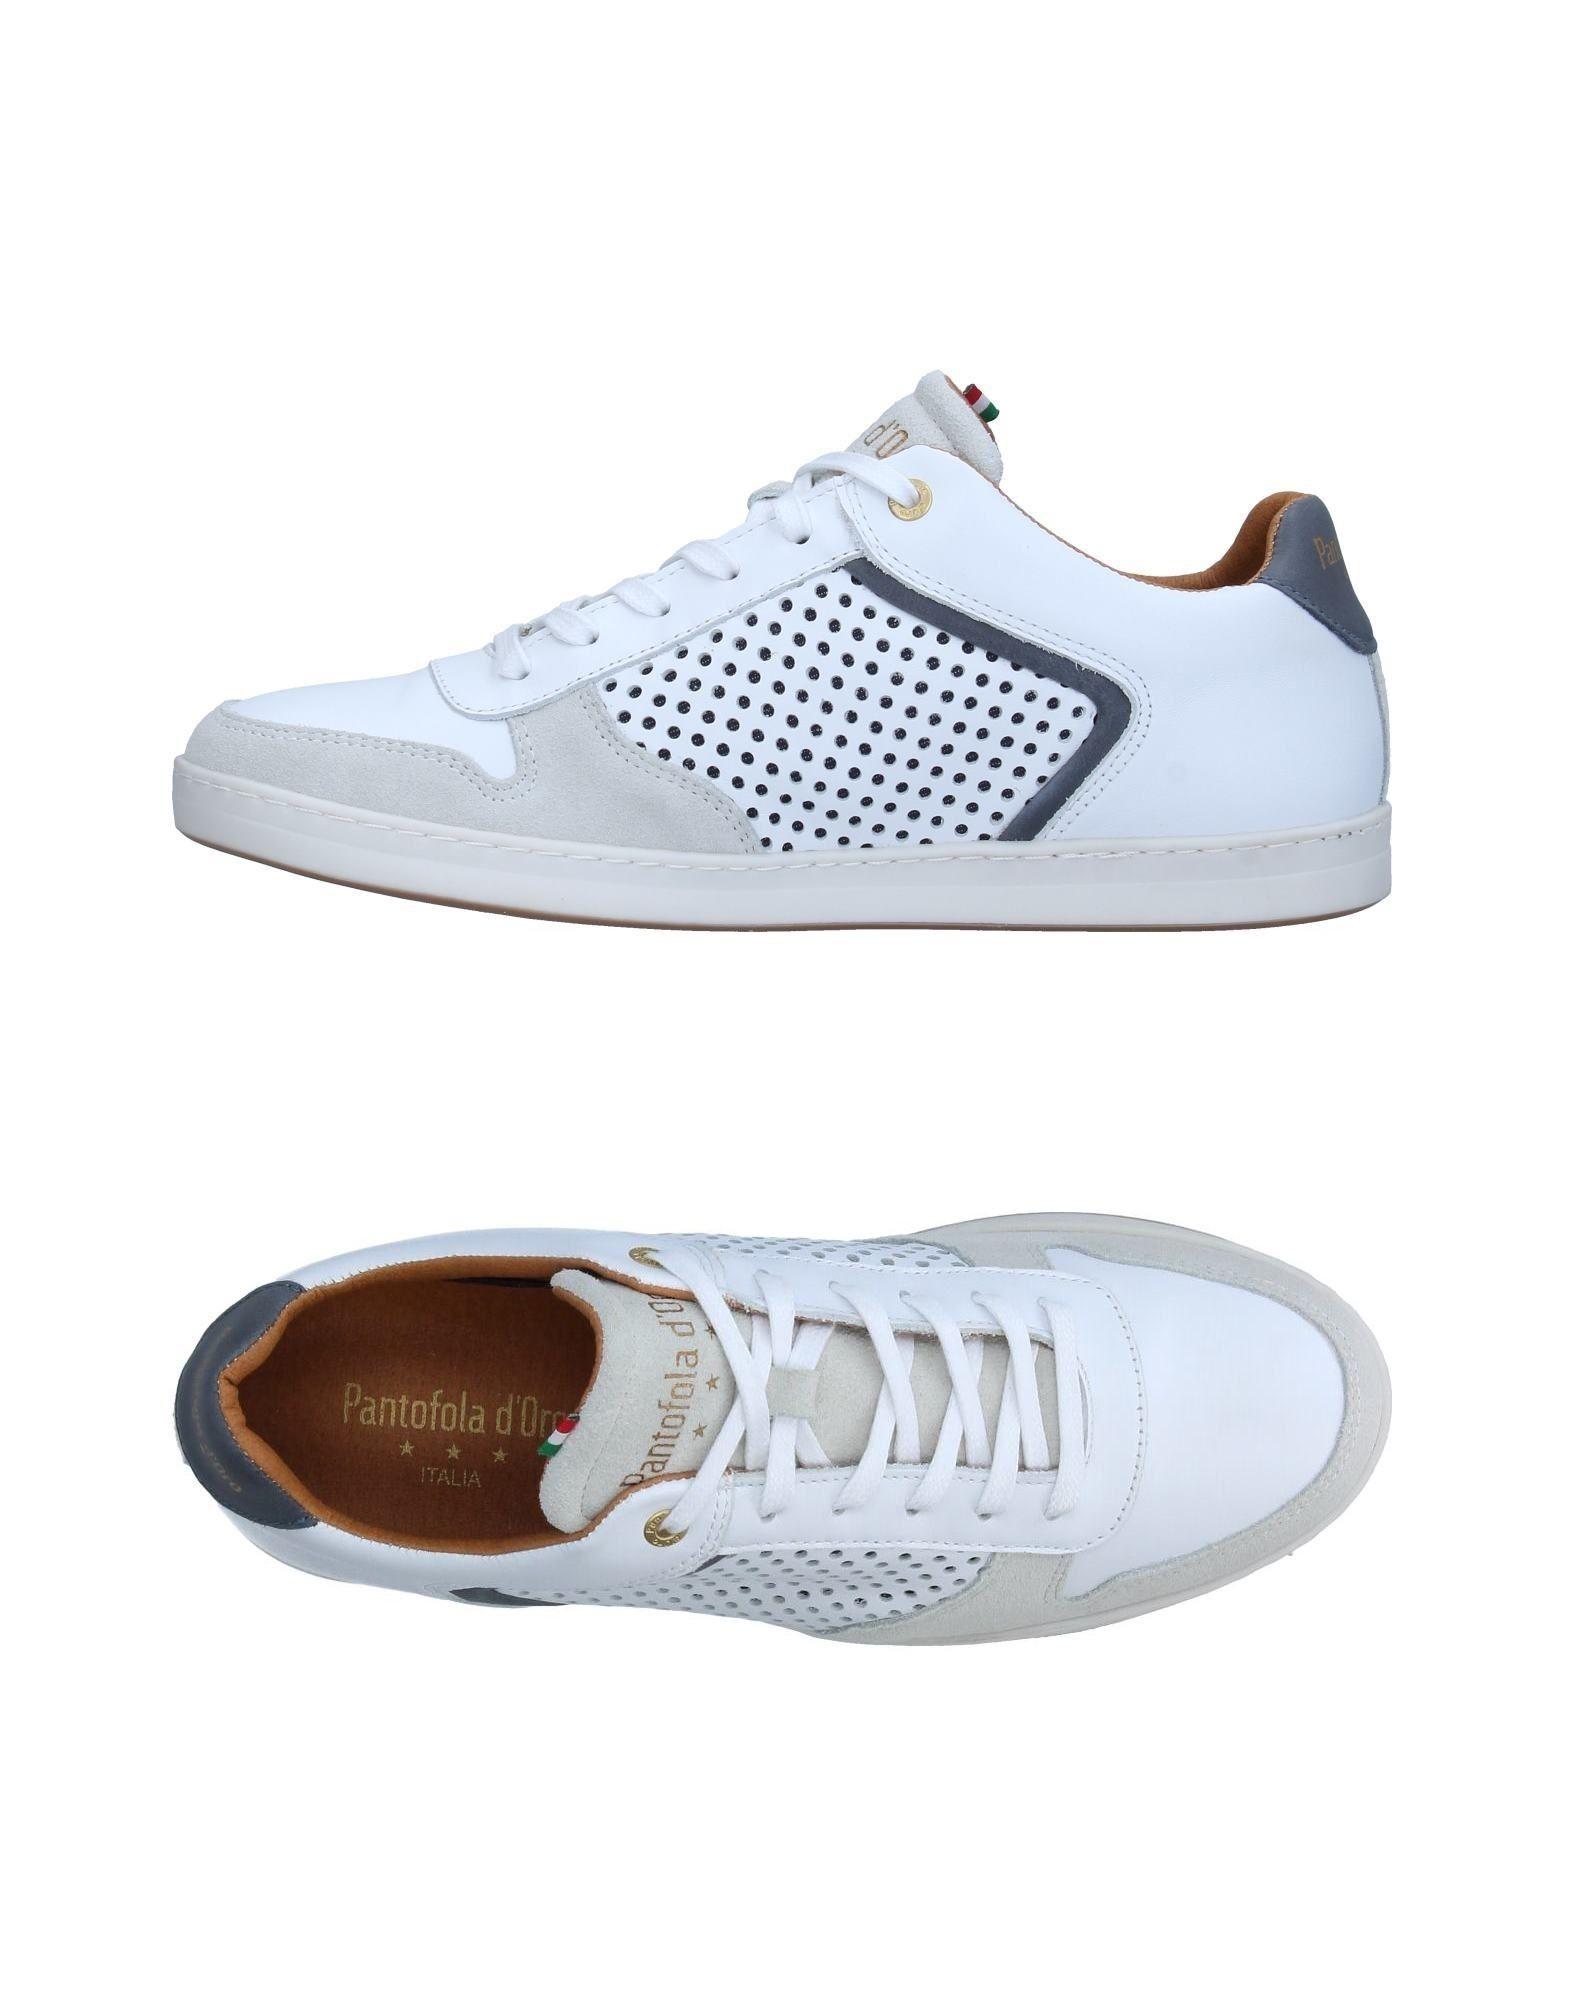 Sneakers Pantofola D'oro Uomo - 11338649MB 11338649MB - 6f9928